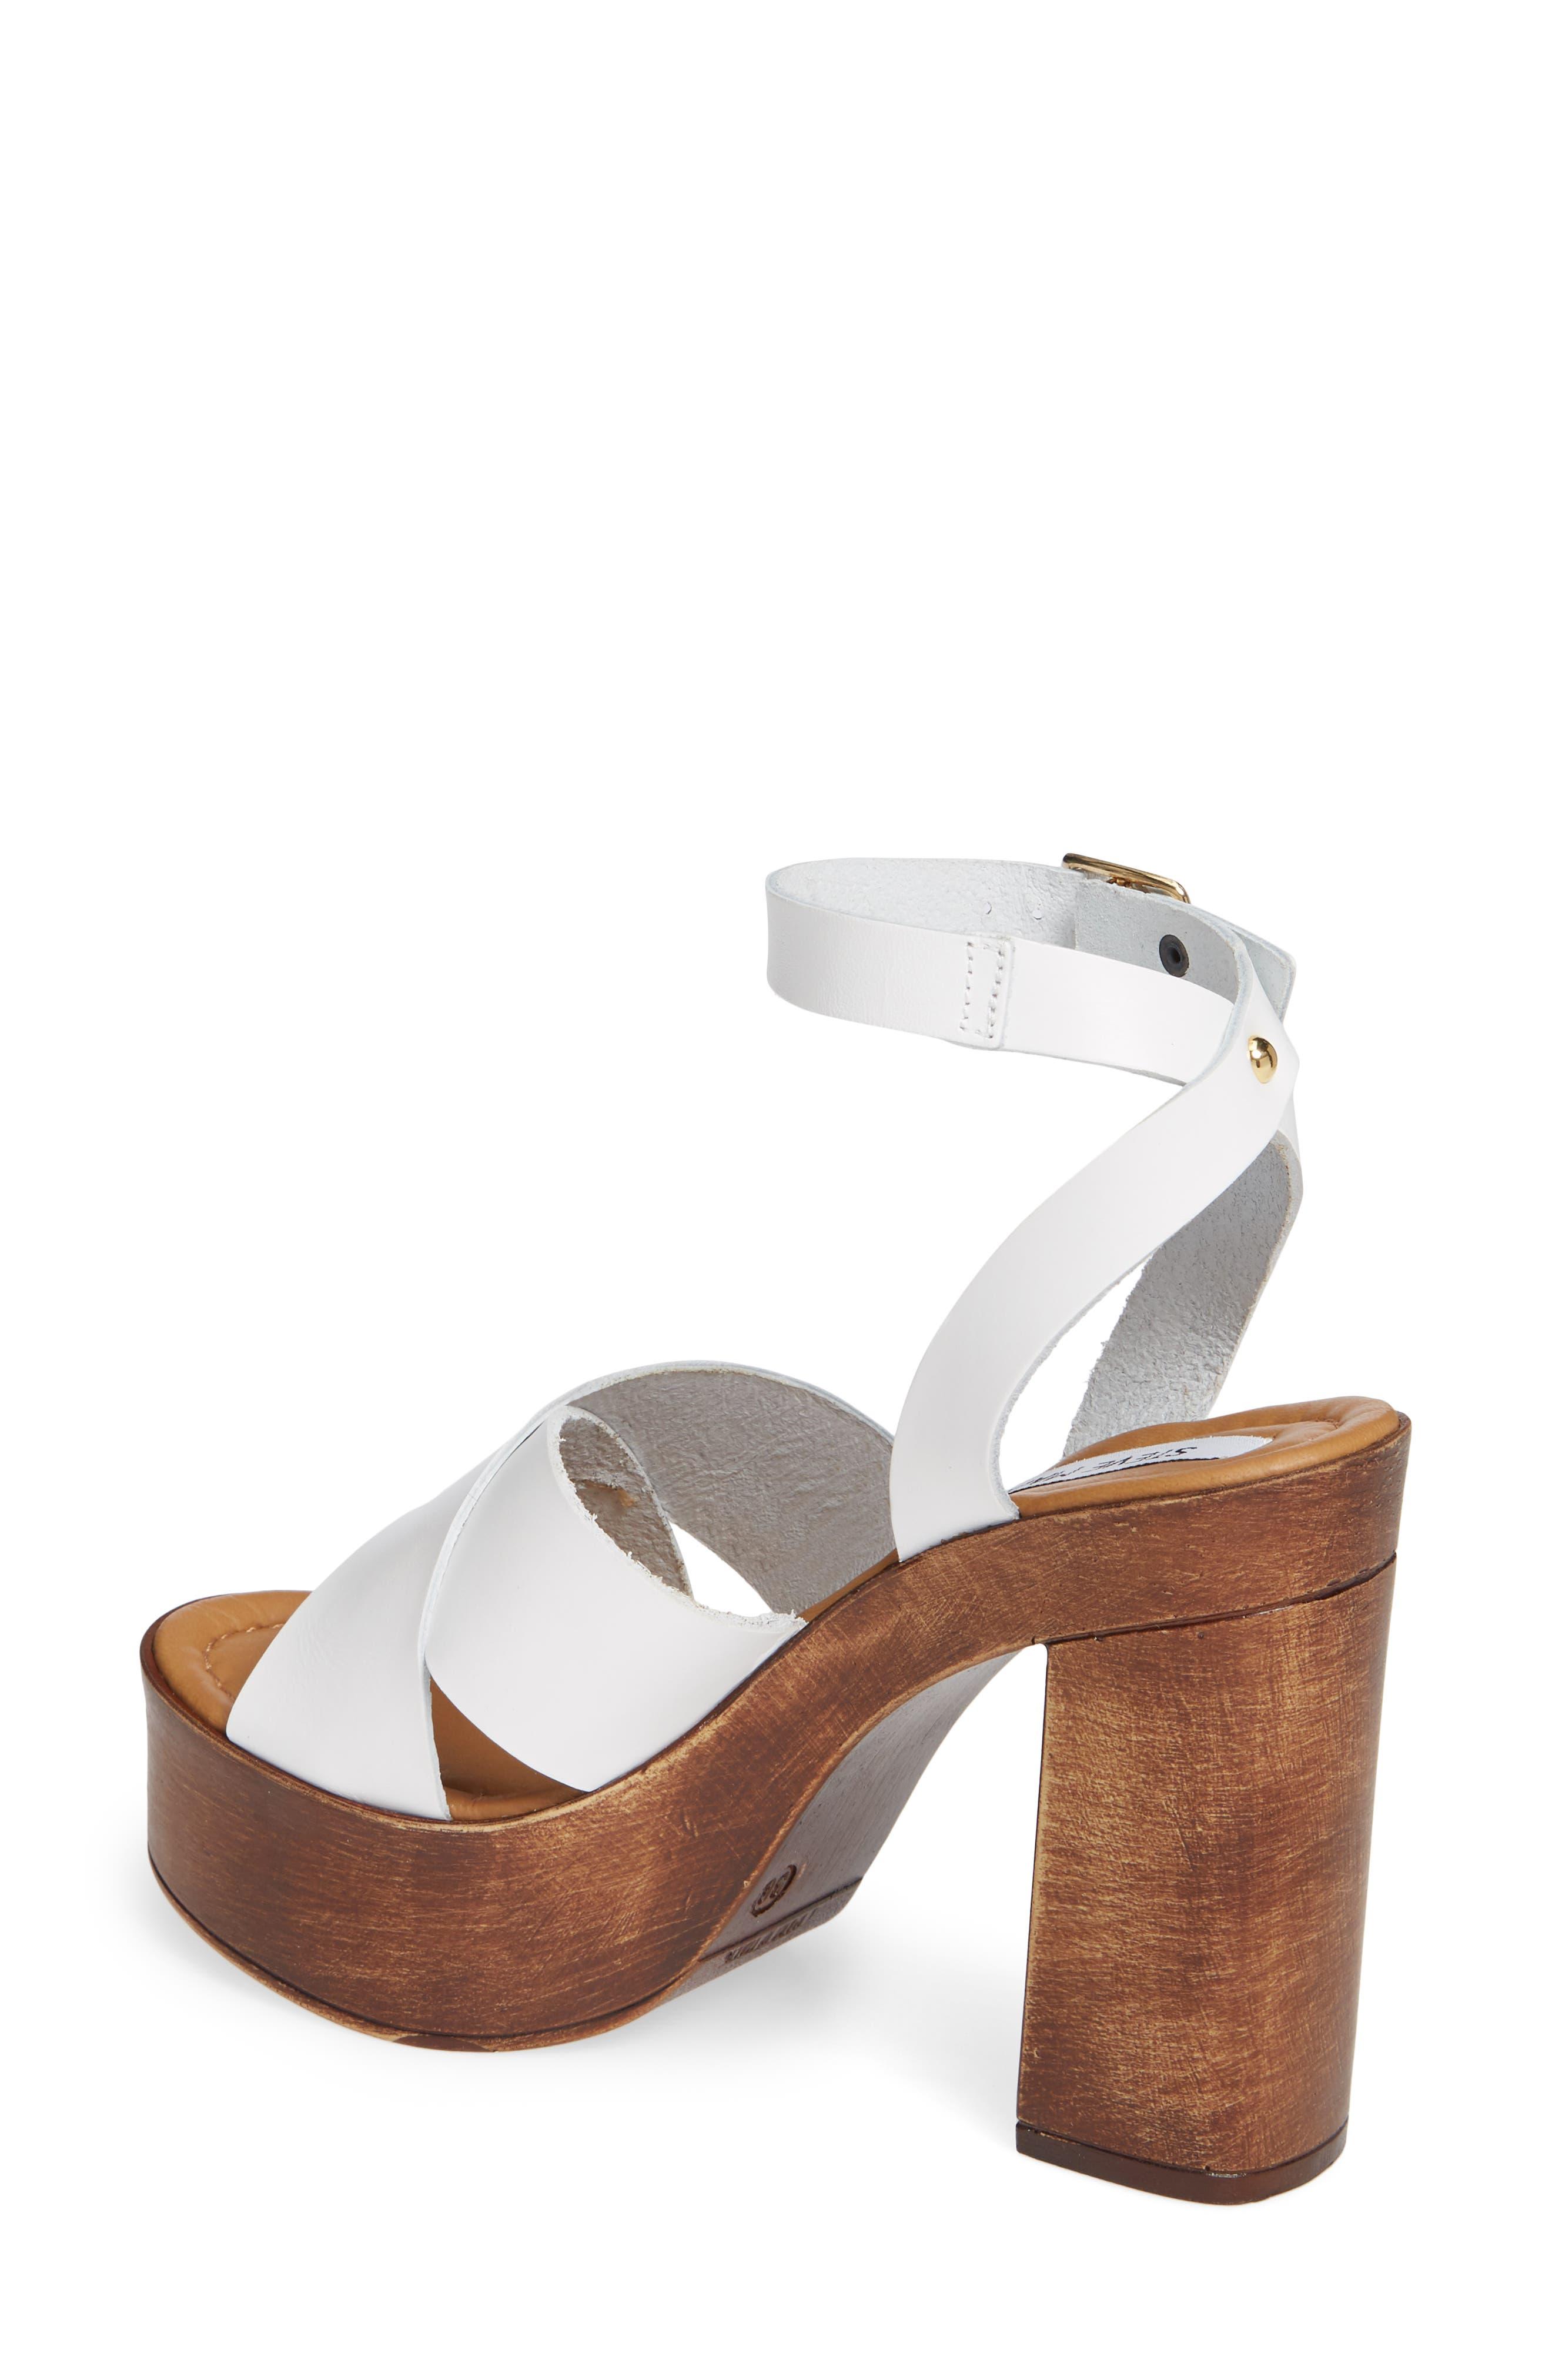 Liliana Platform Sandal,                             Alternate thumbnail 2, color,                             110